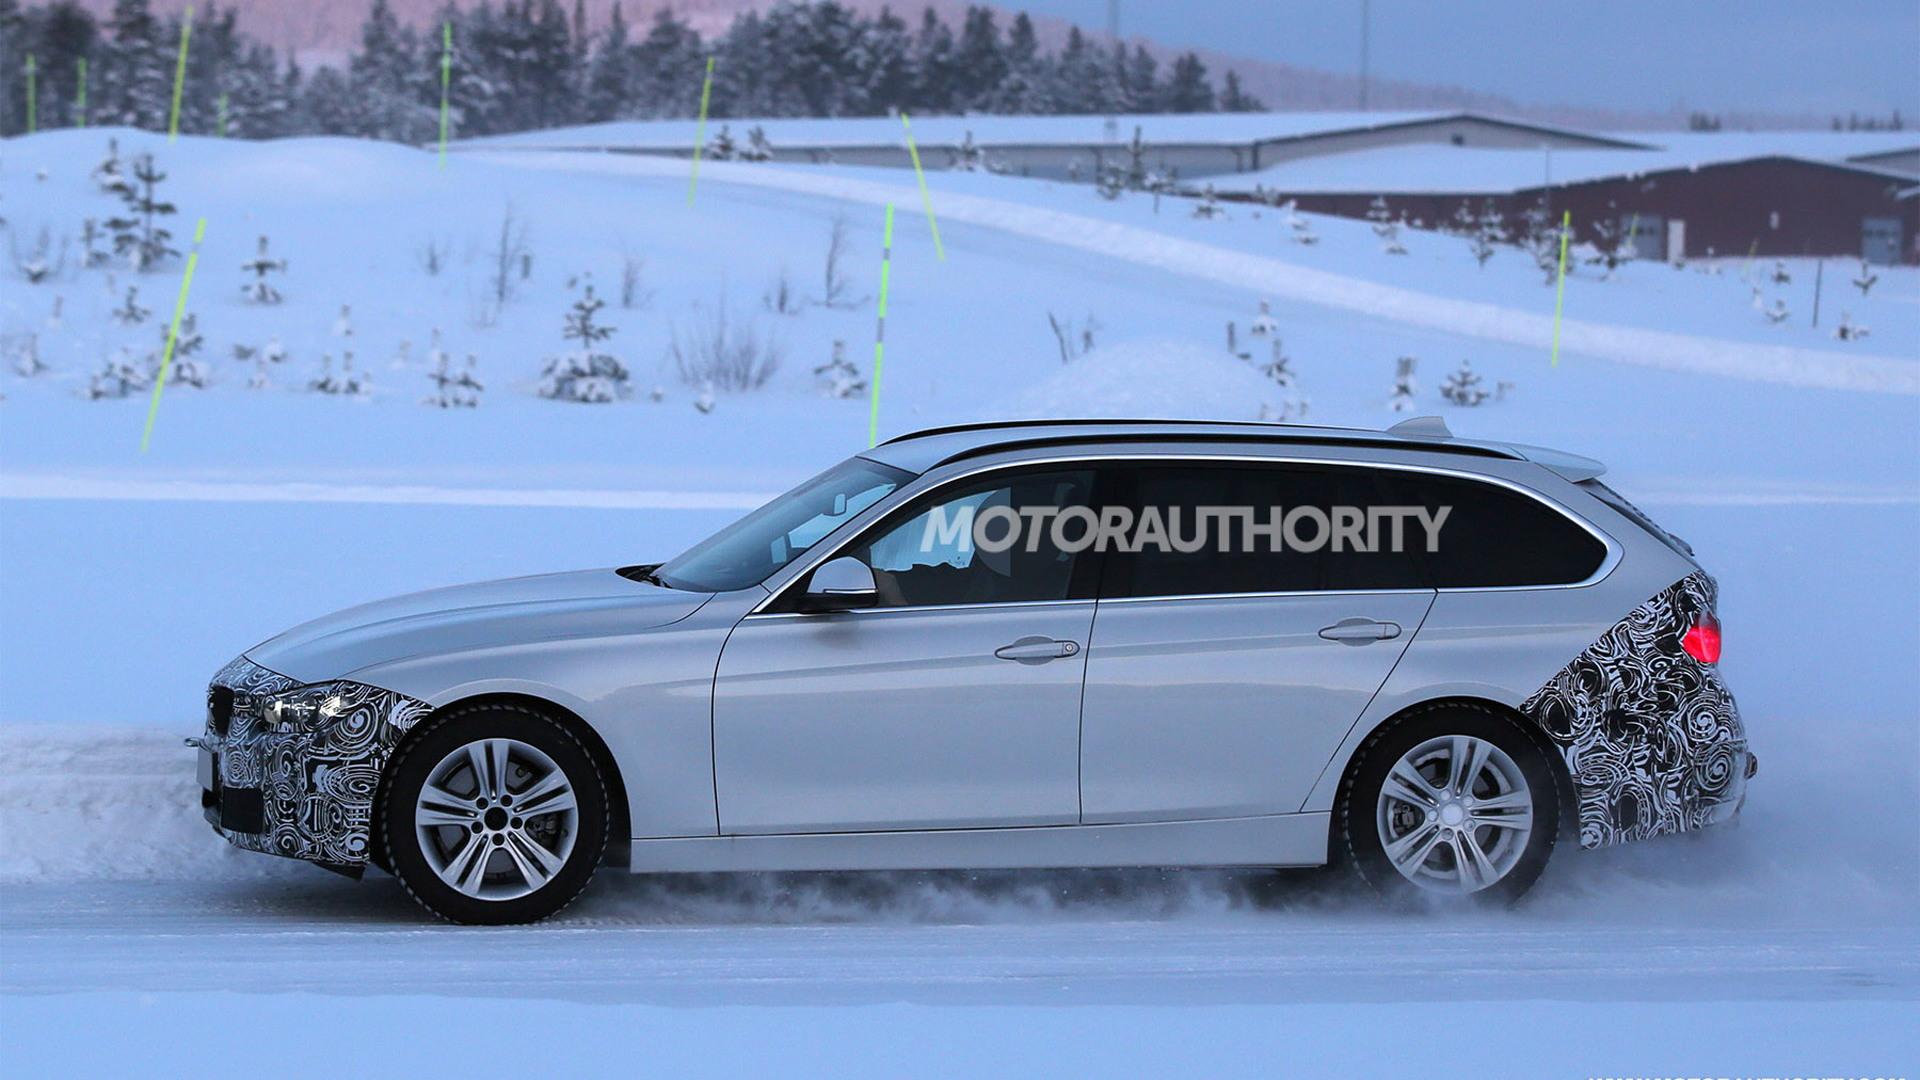 2016 BMW 3-Series Sports Wagon (Touring) facelift spy shots - Image via S. Baldauf/SB-Medien